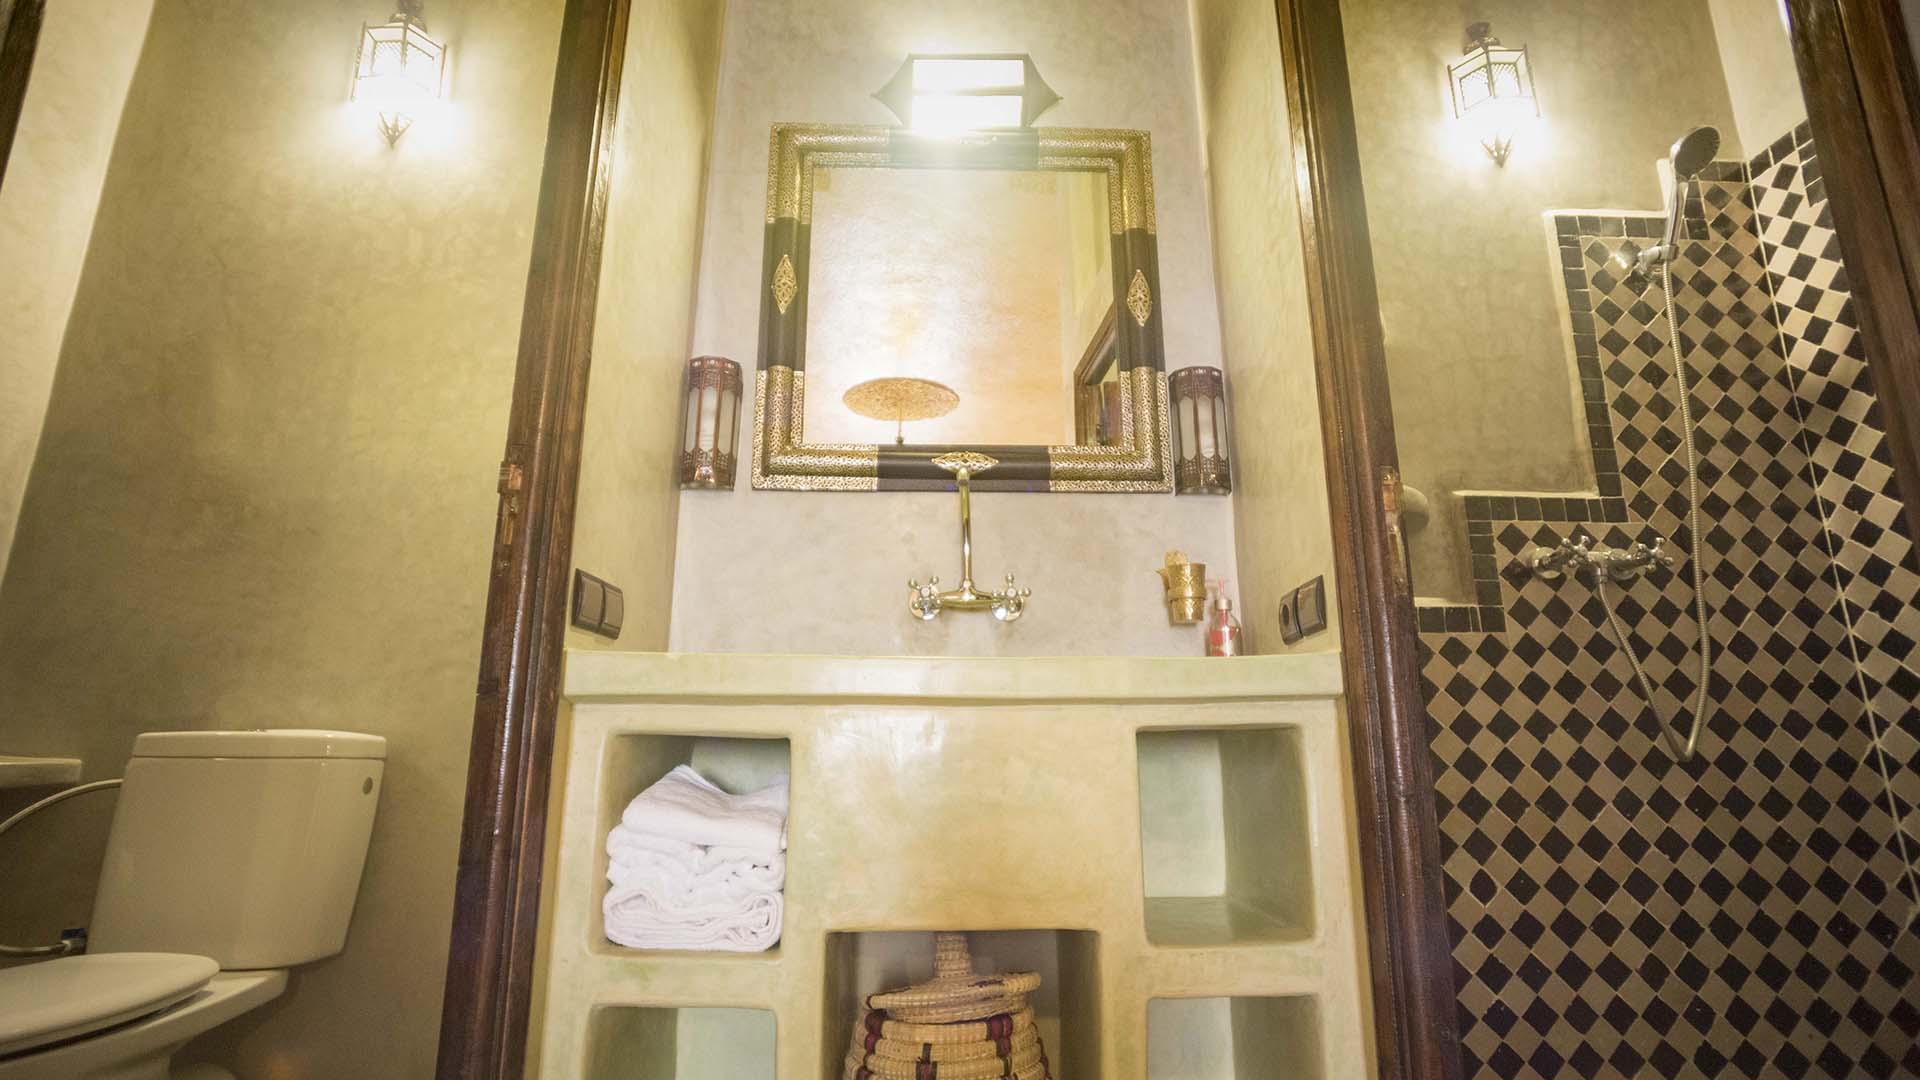 Accommodations Ouarzazate Quadruple Room bathroom